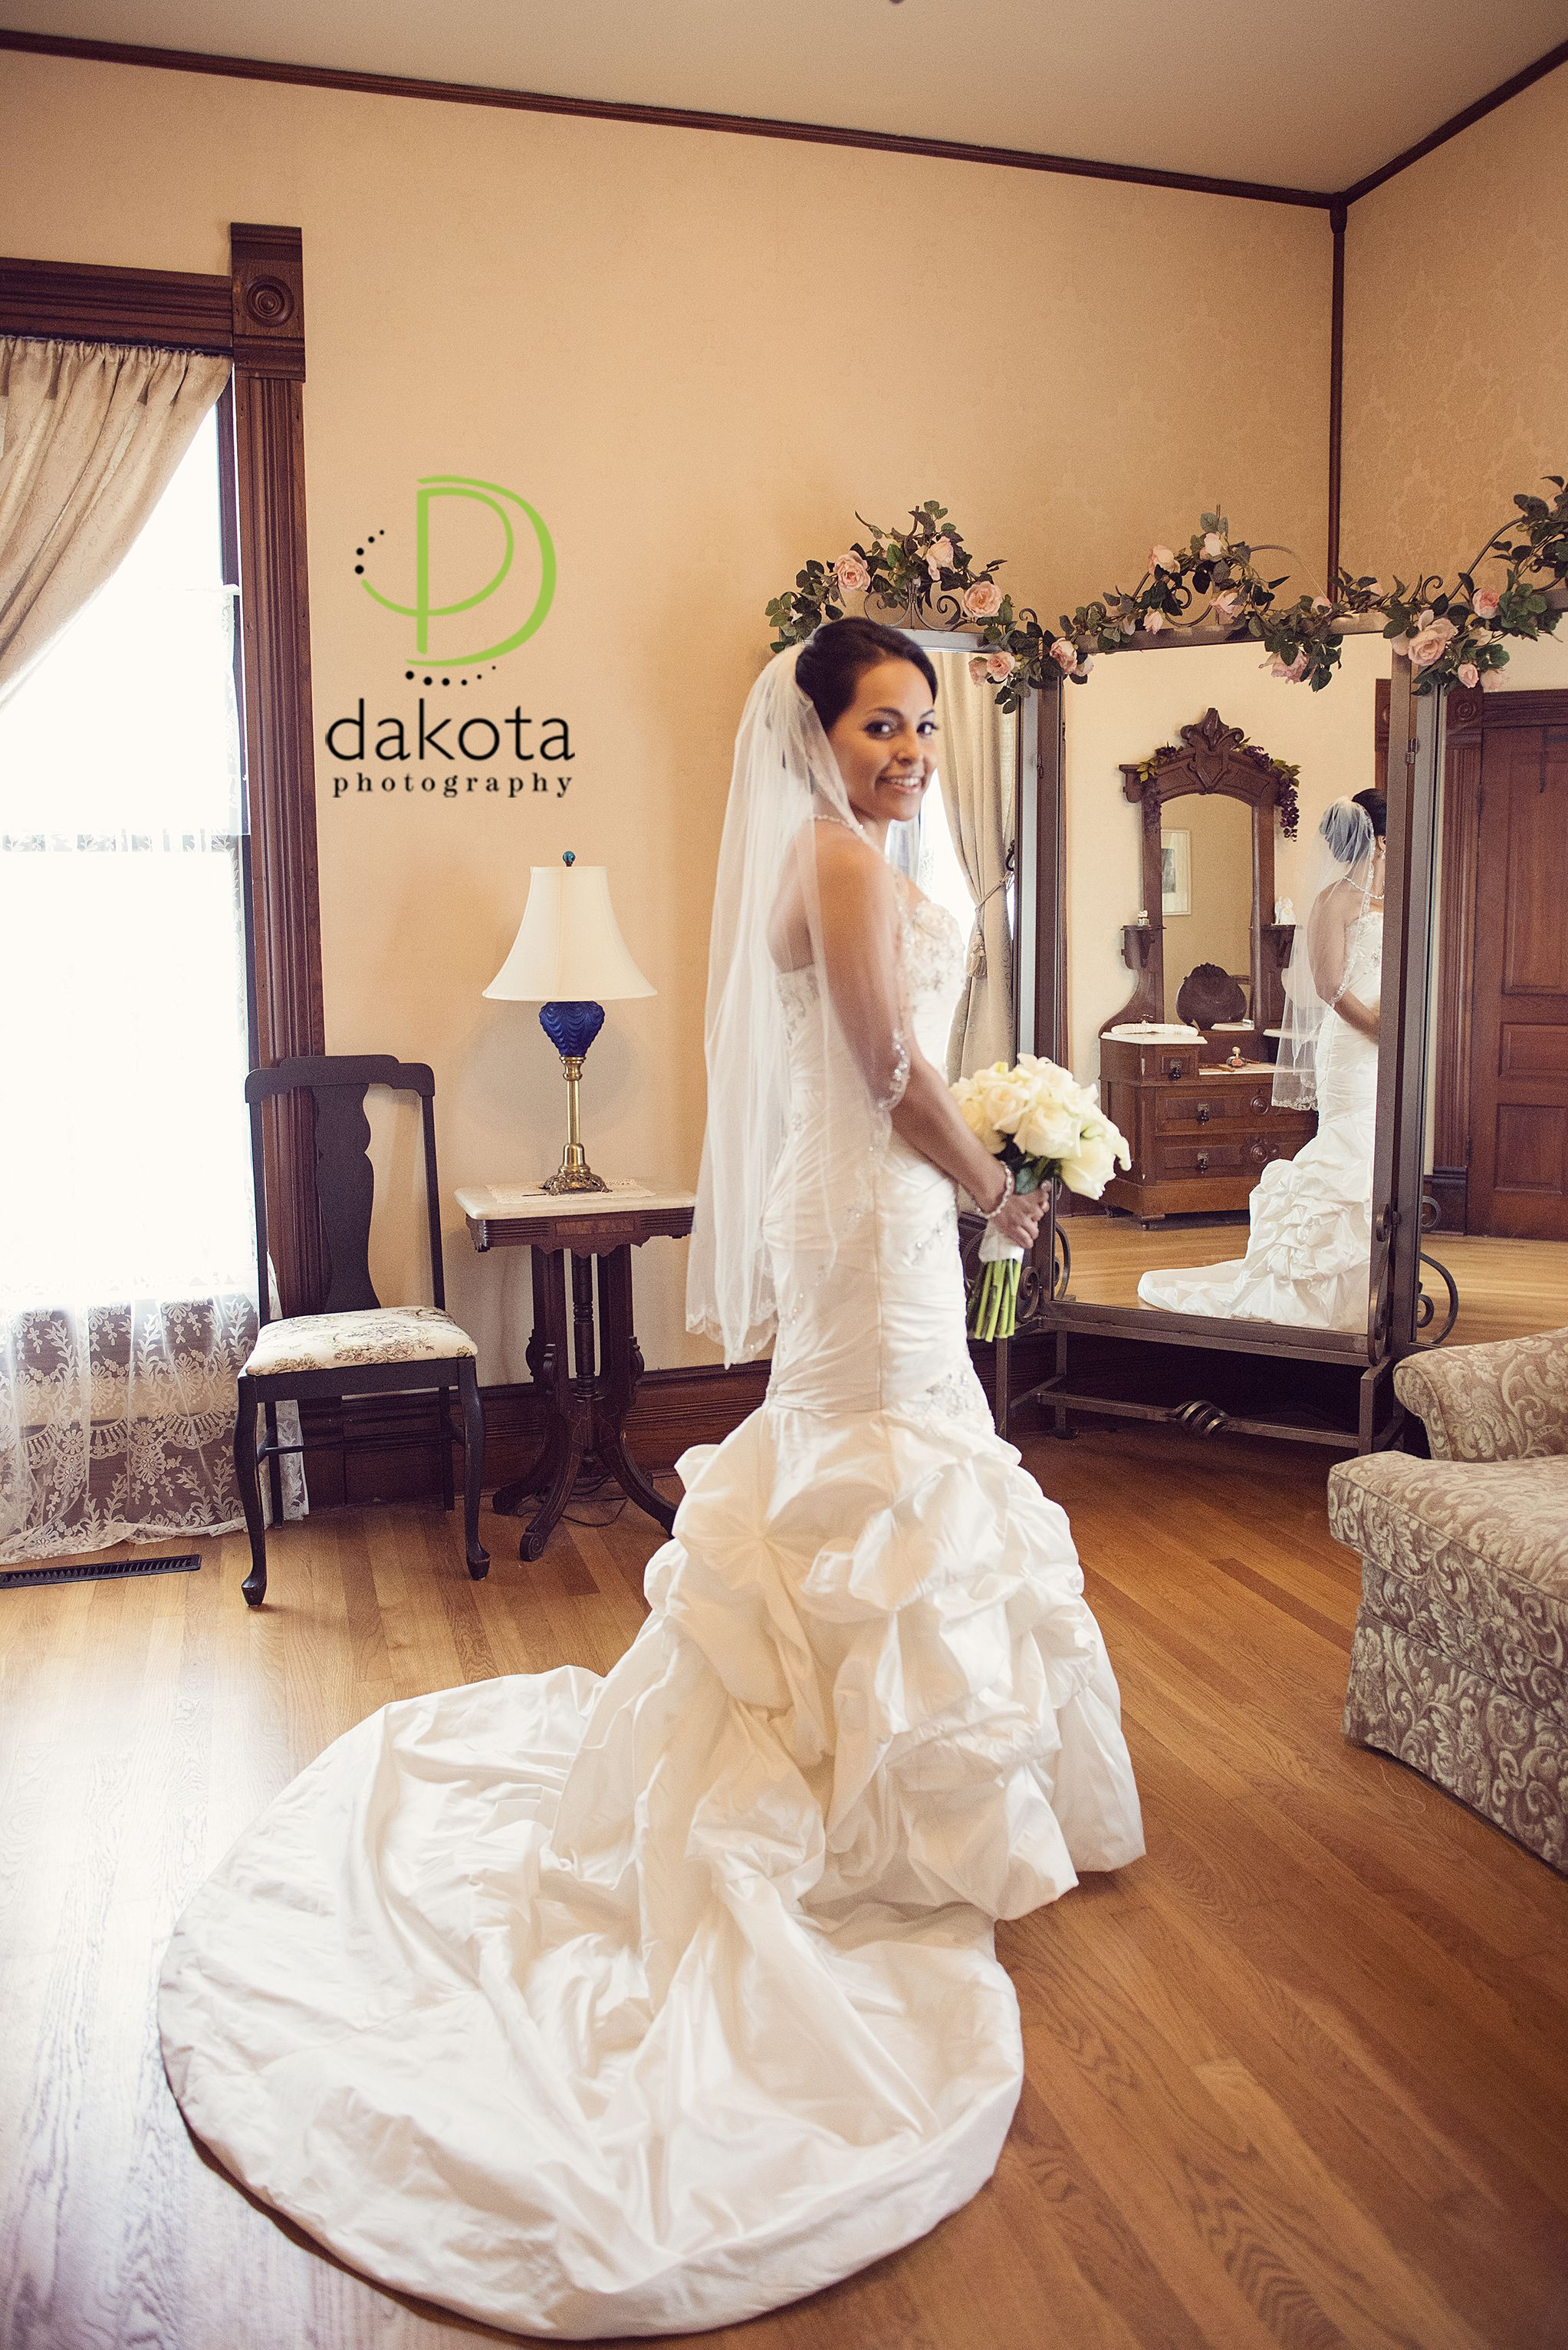 Frisco Heritage Center - Bridals, bride, Frisco Heritage Center, Bridal pictures, bridals at Frisco Heritage Center